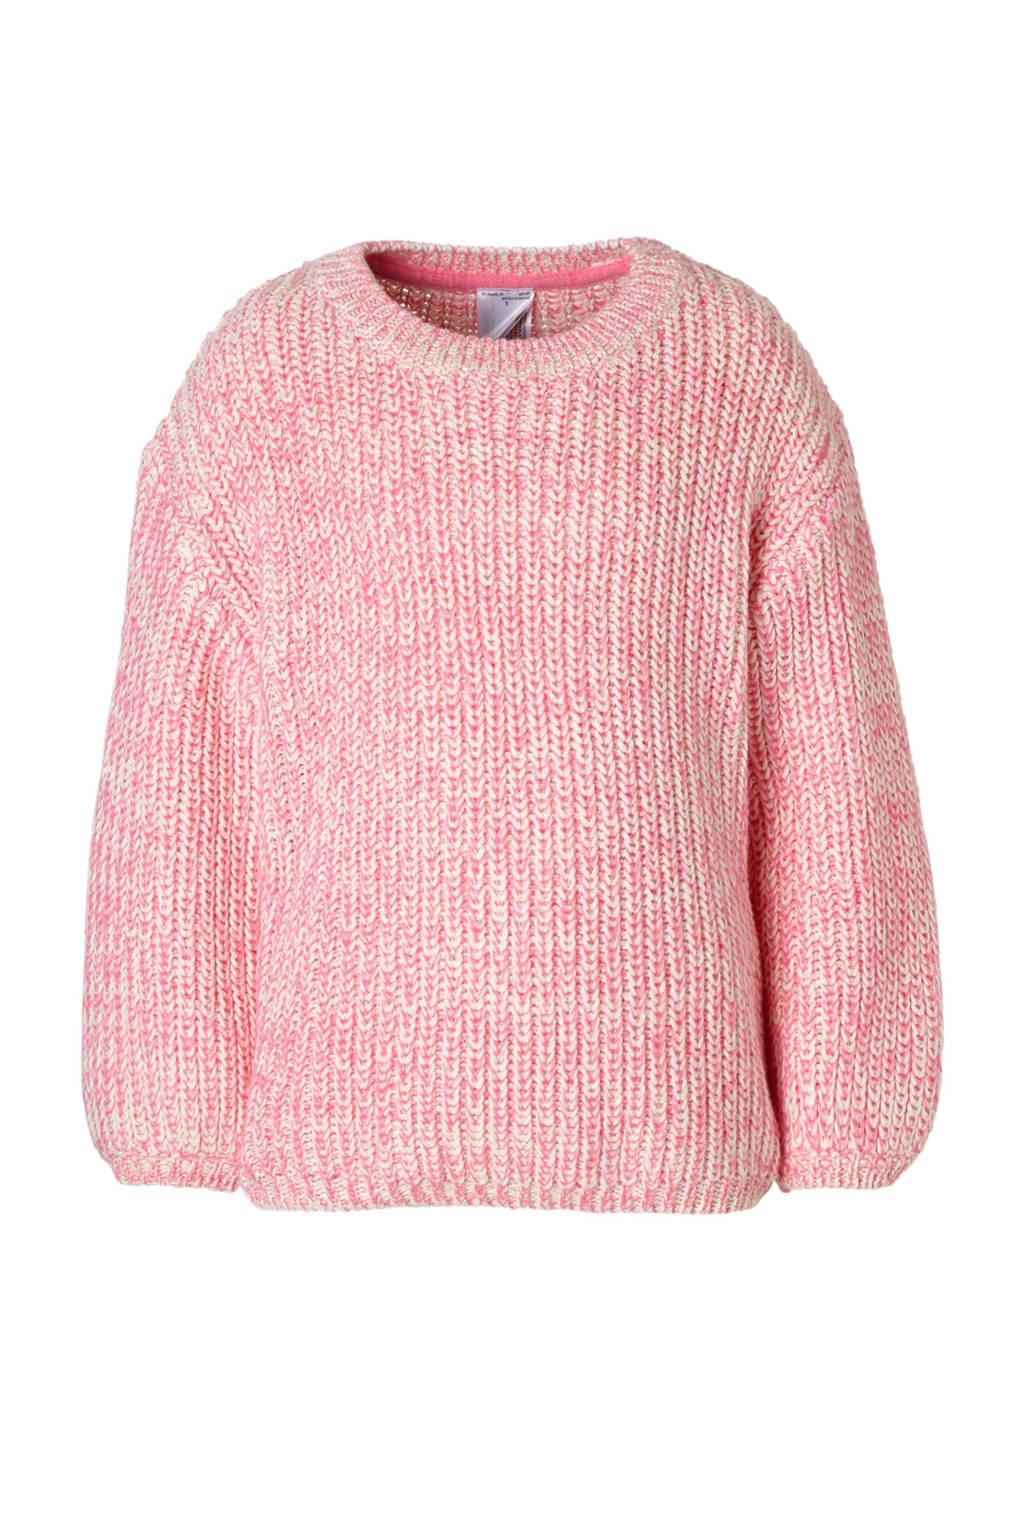 C&A Palomino gemêleerde trui roze, Roze